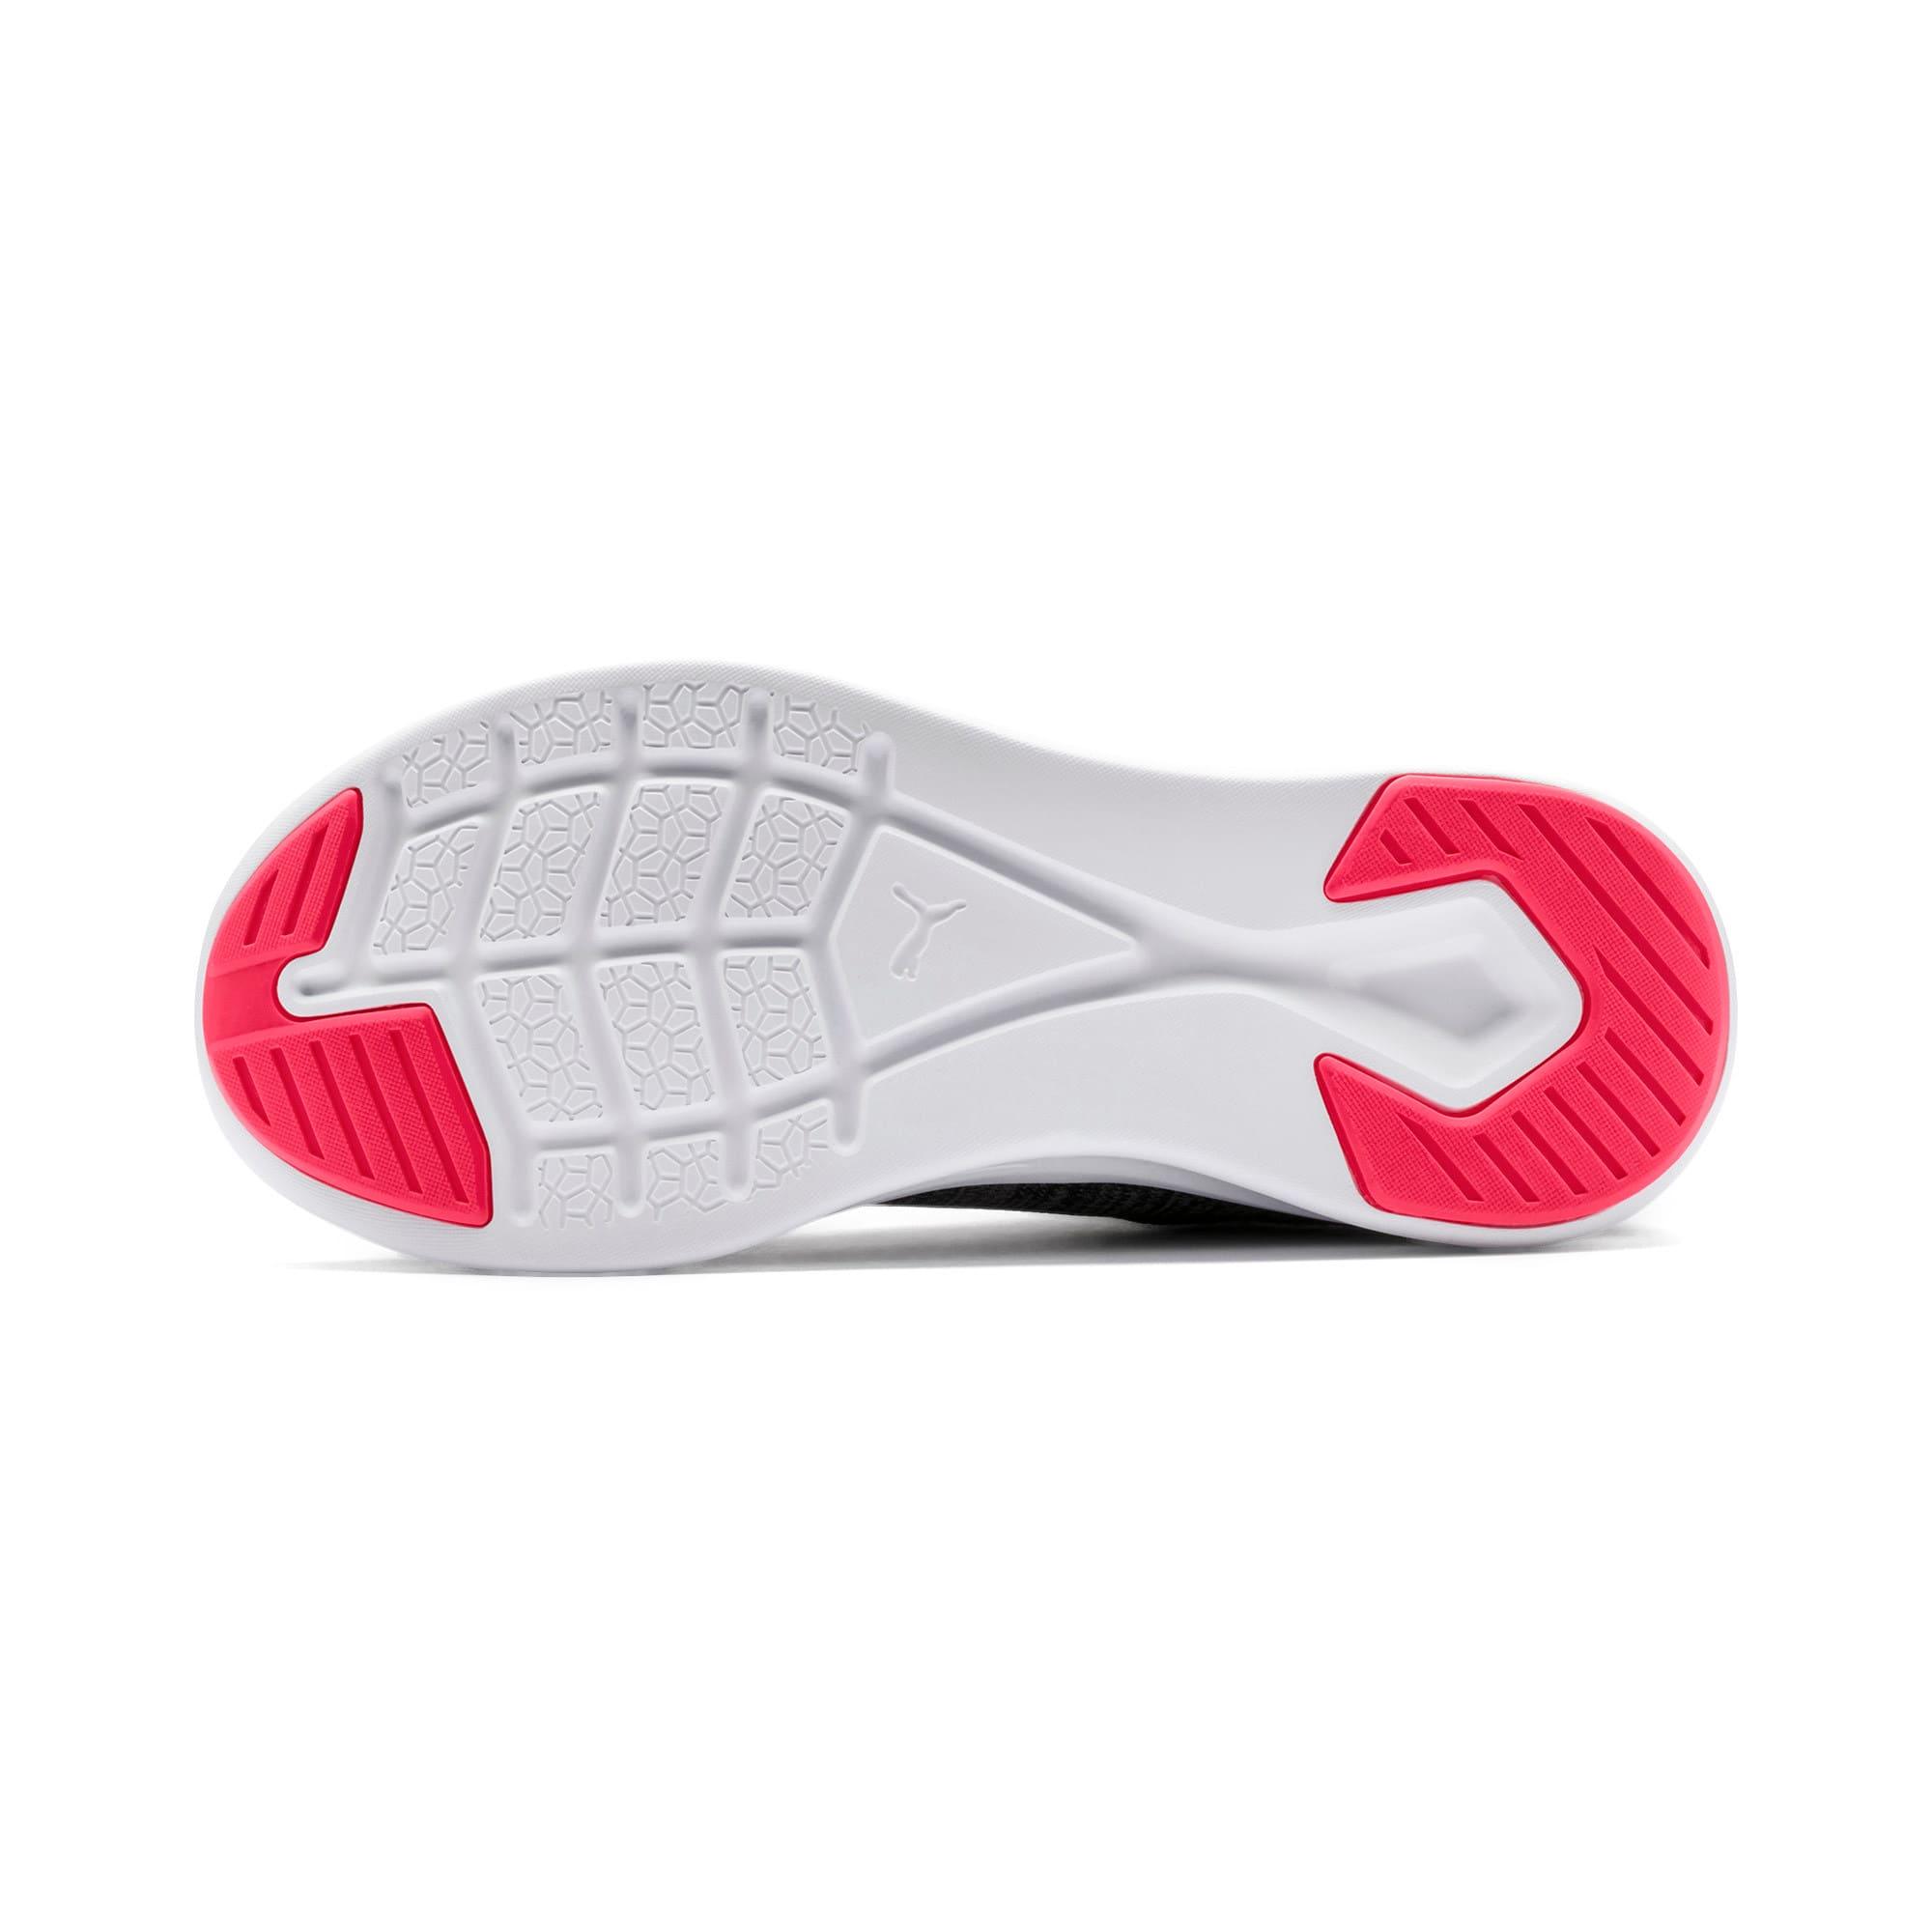 Thumbnail 5 of IGNITE Flash evoKNIT Women's Running Shoes, Black-White-Pink Alert, medium